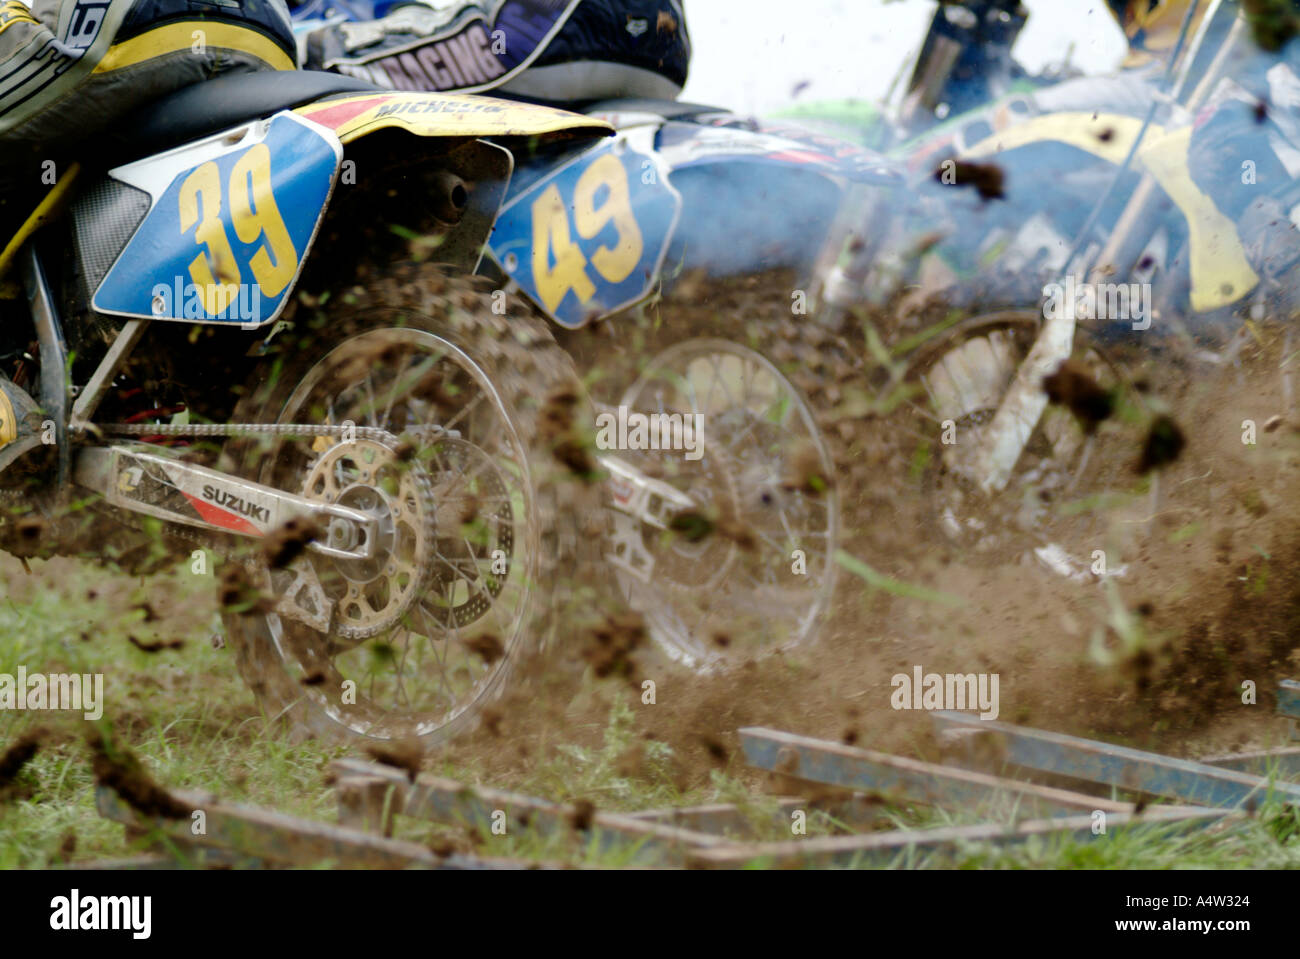 Acceleration Motor Cross X Moto Dirt Bike Scramble Risk Extreme